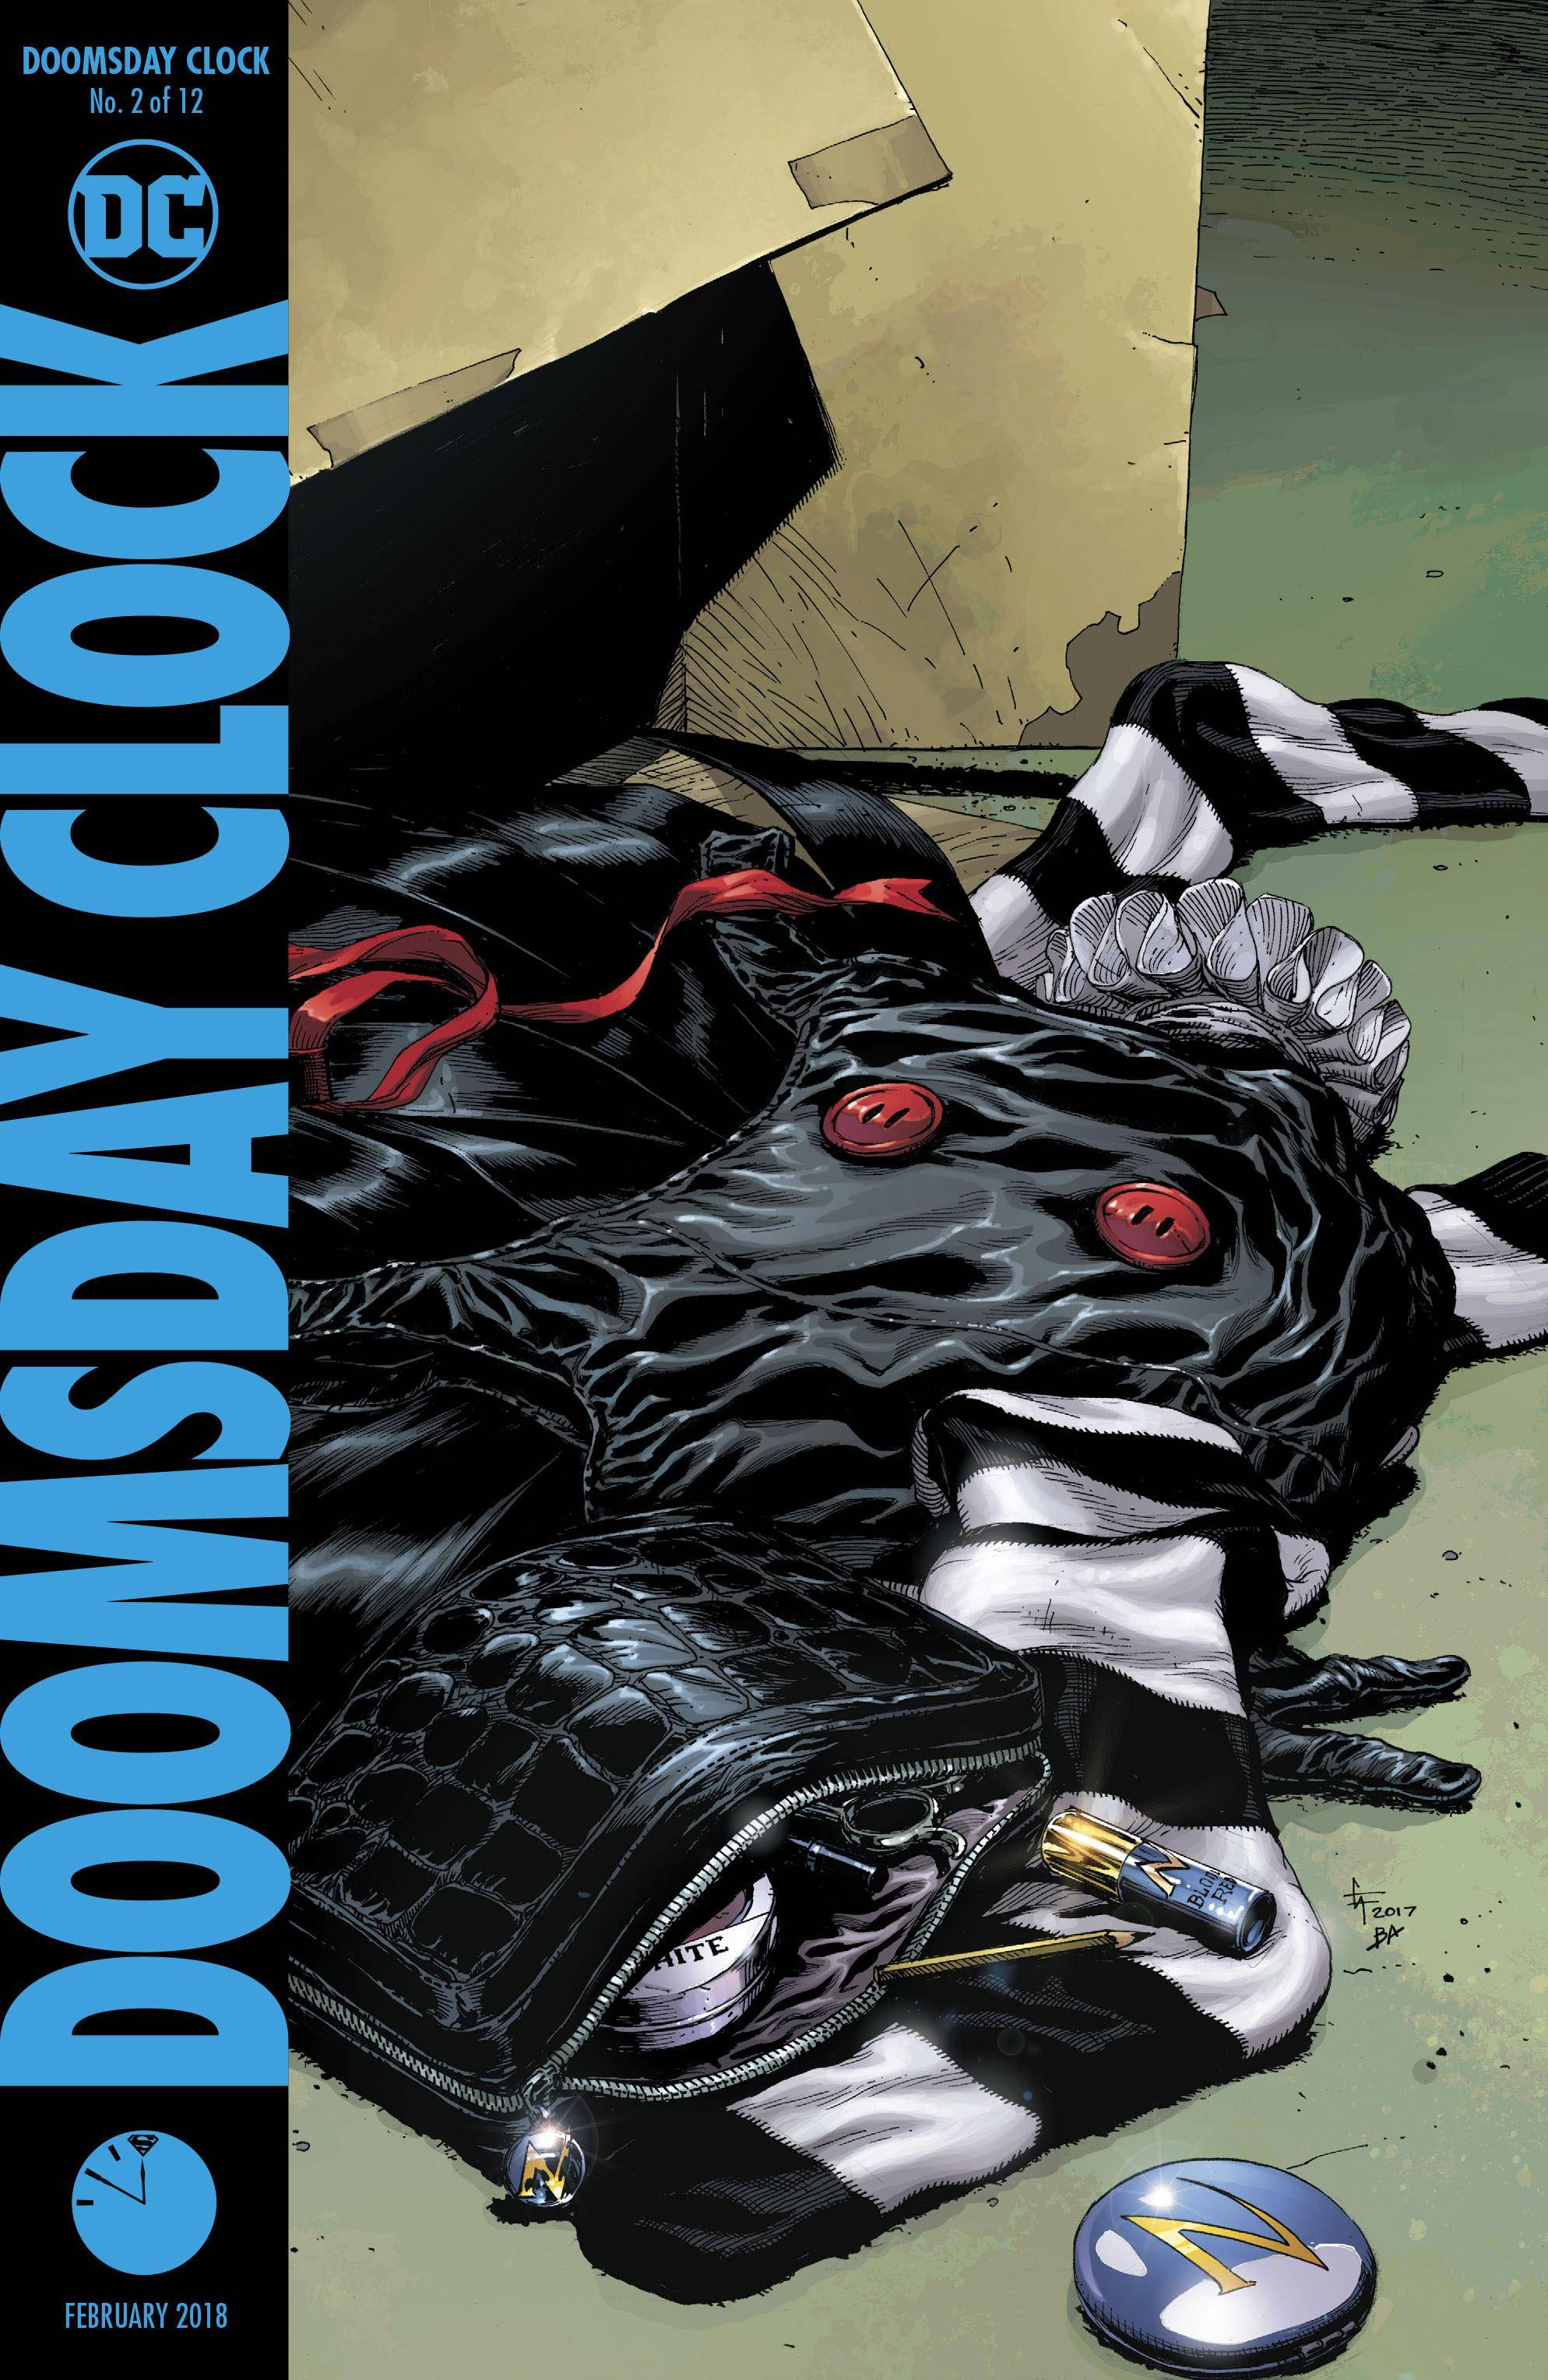 Doomsday Clock 02 of 12 2018 Webrip The Last Kryptonian-DCP